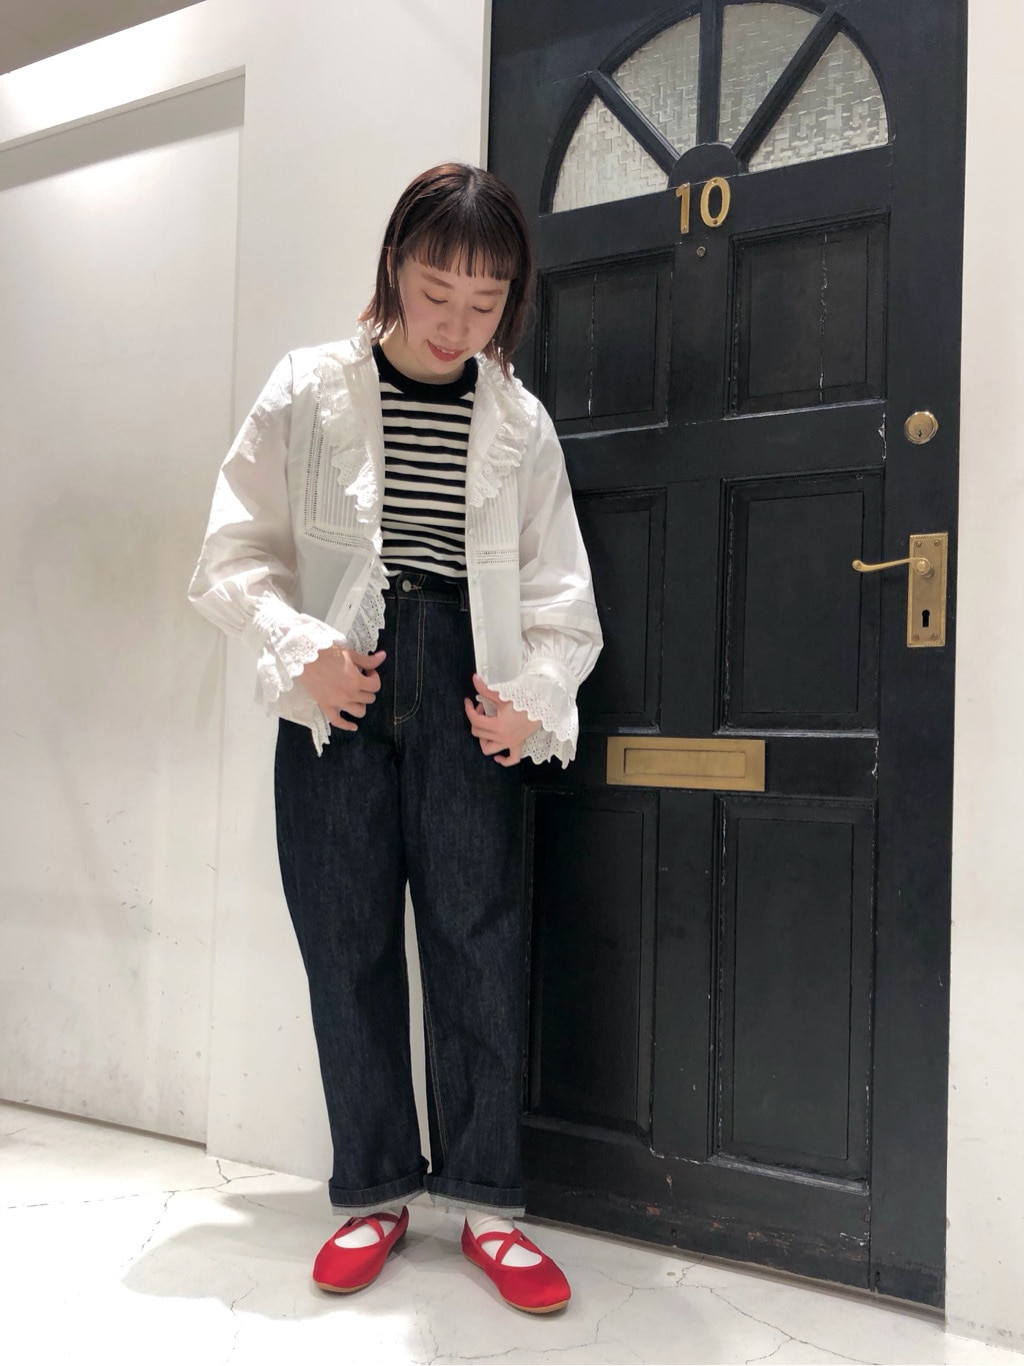 Dot and Stripes CHILD WOMAN ルクアイーレ 身長:157cm 2021.04.29